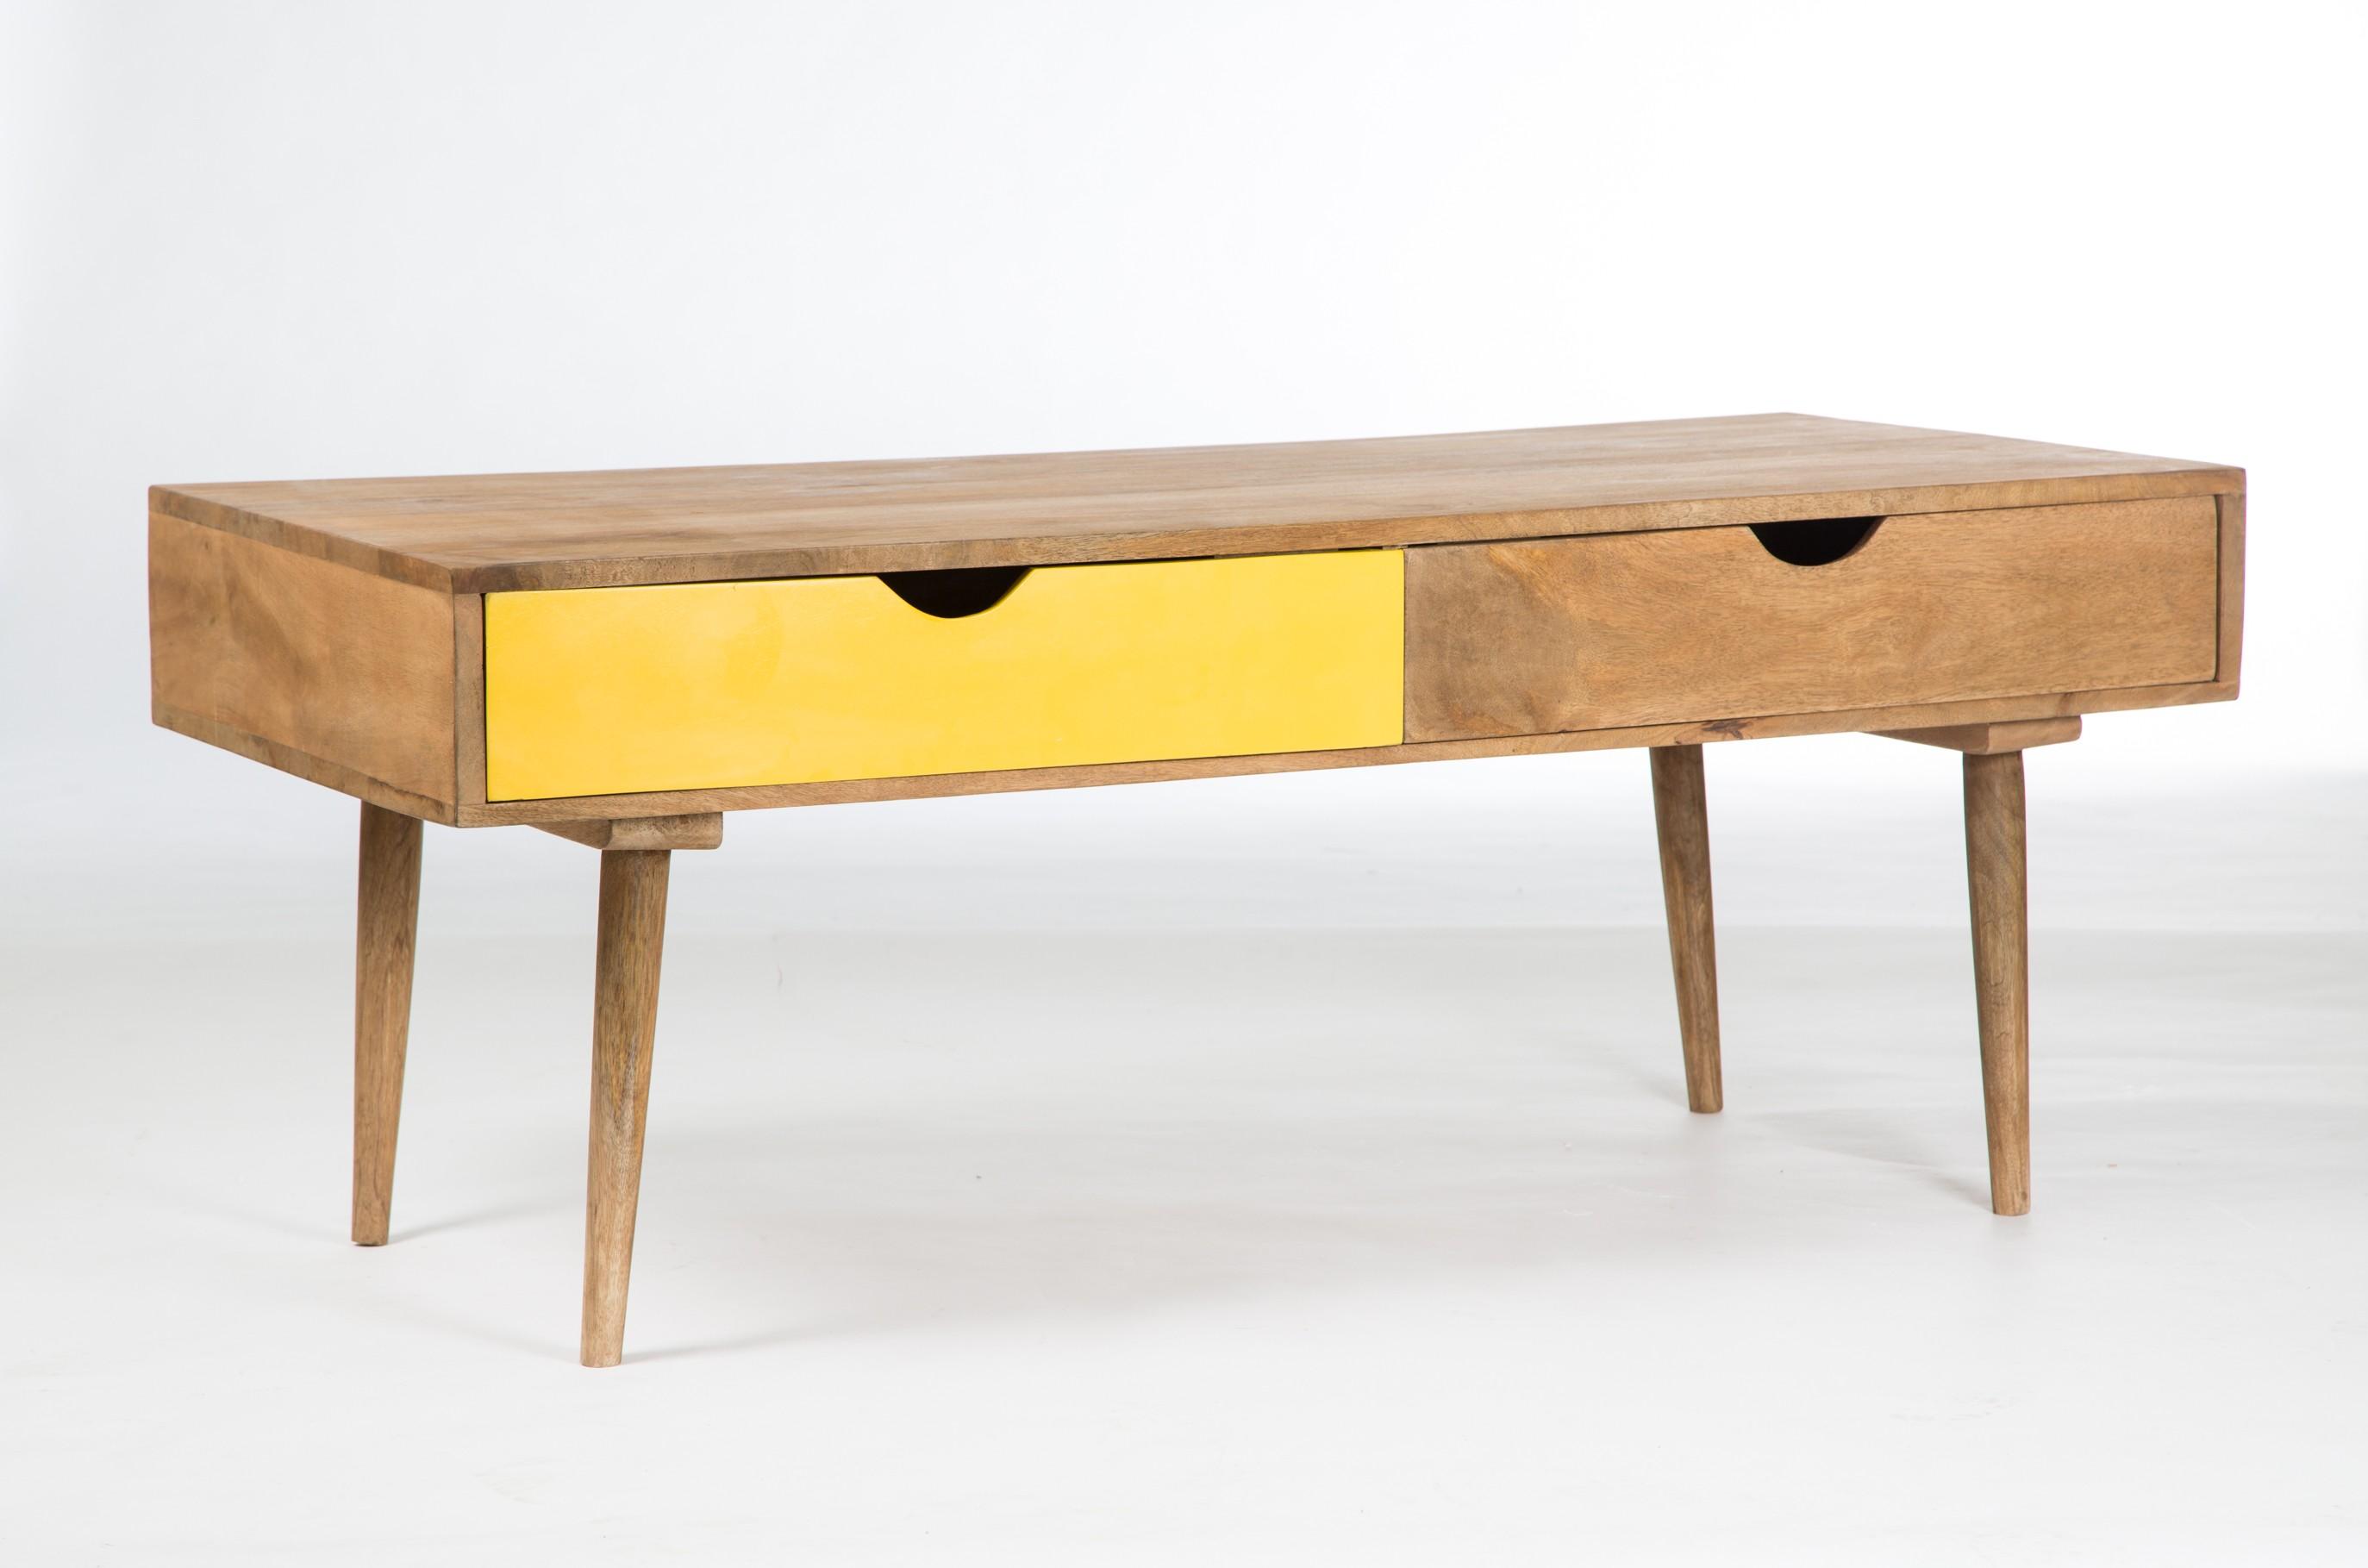 Table basse bois clair scandinave